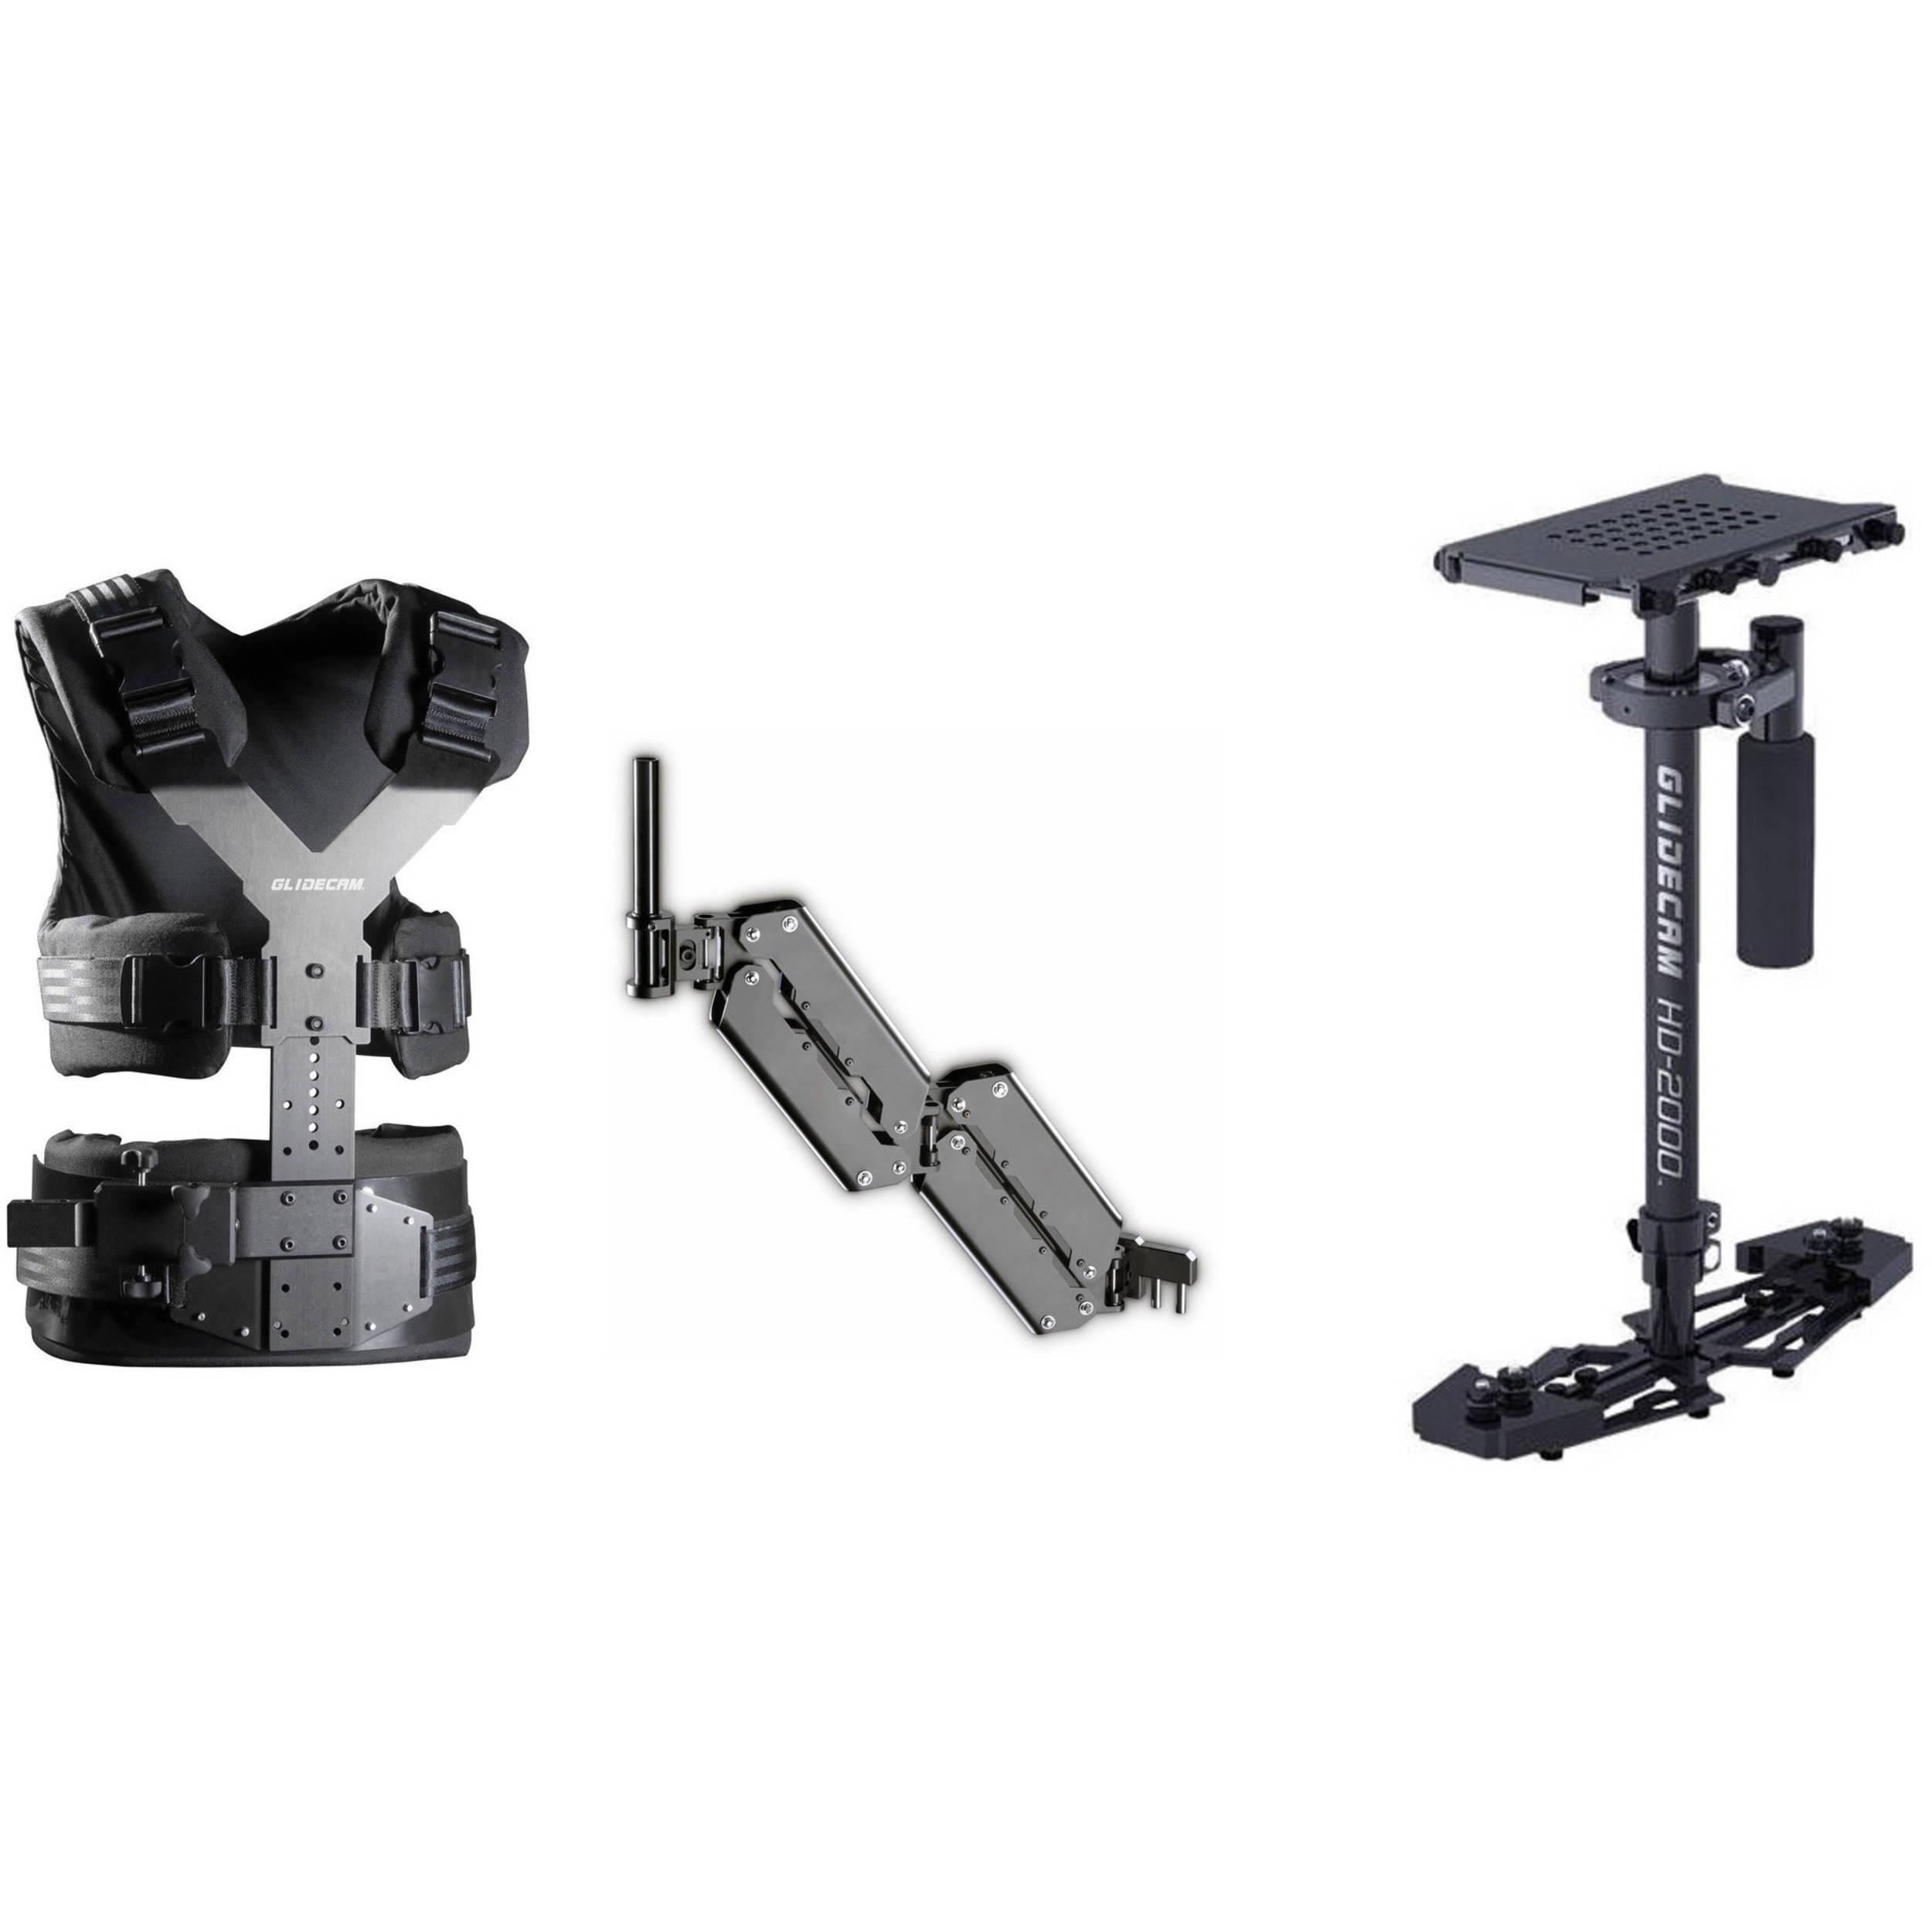 Glidecam Industries, Inc. - World Class Camera Stabilizers